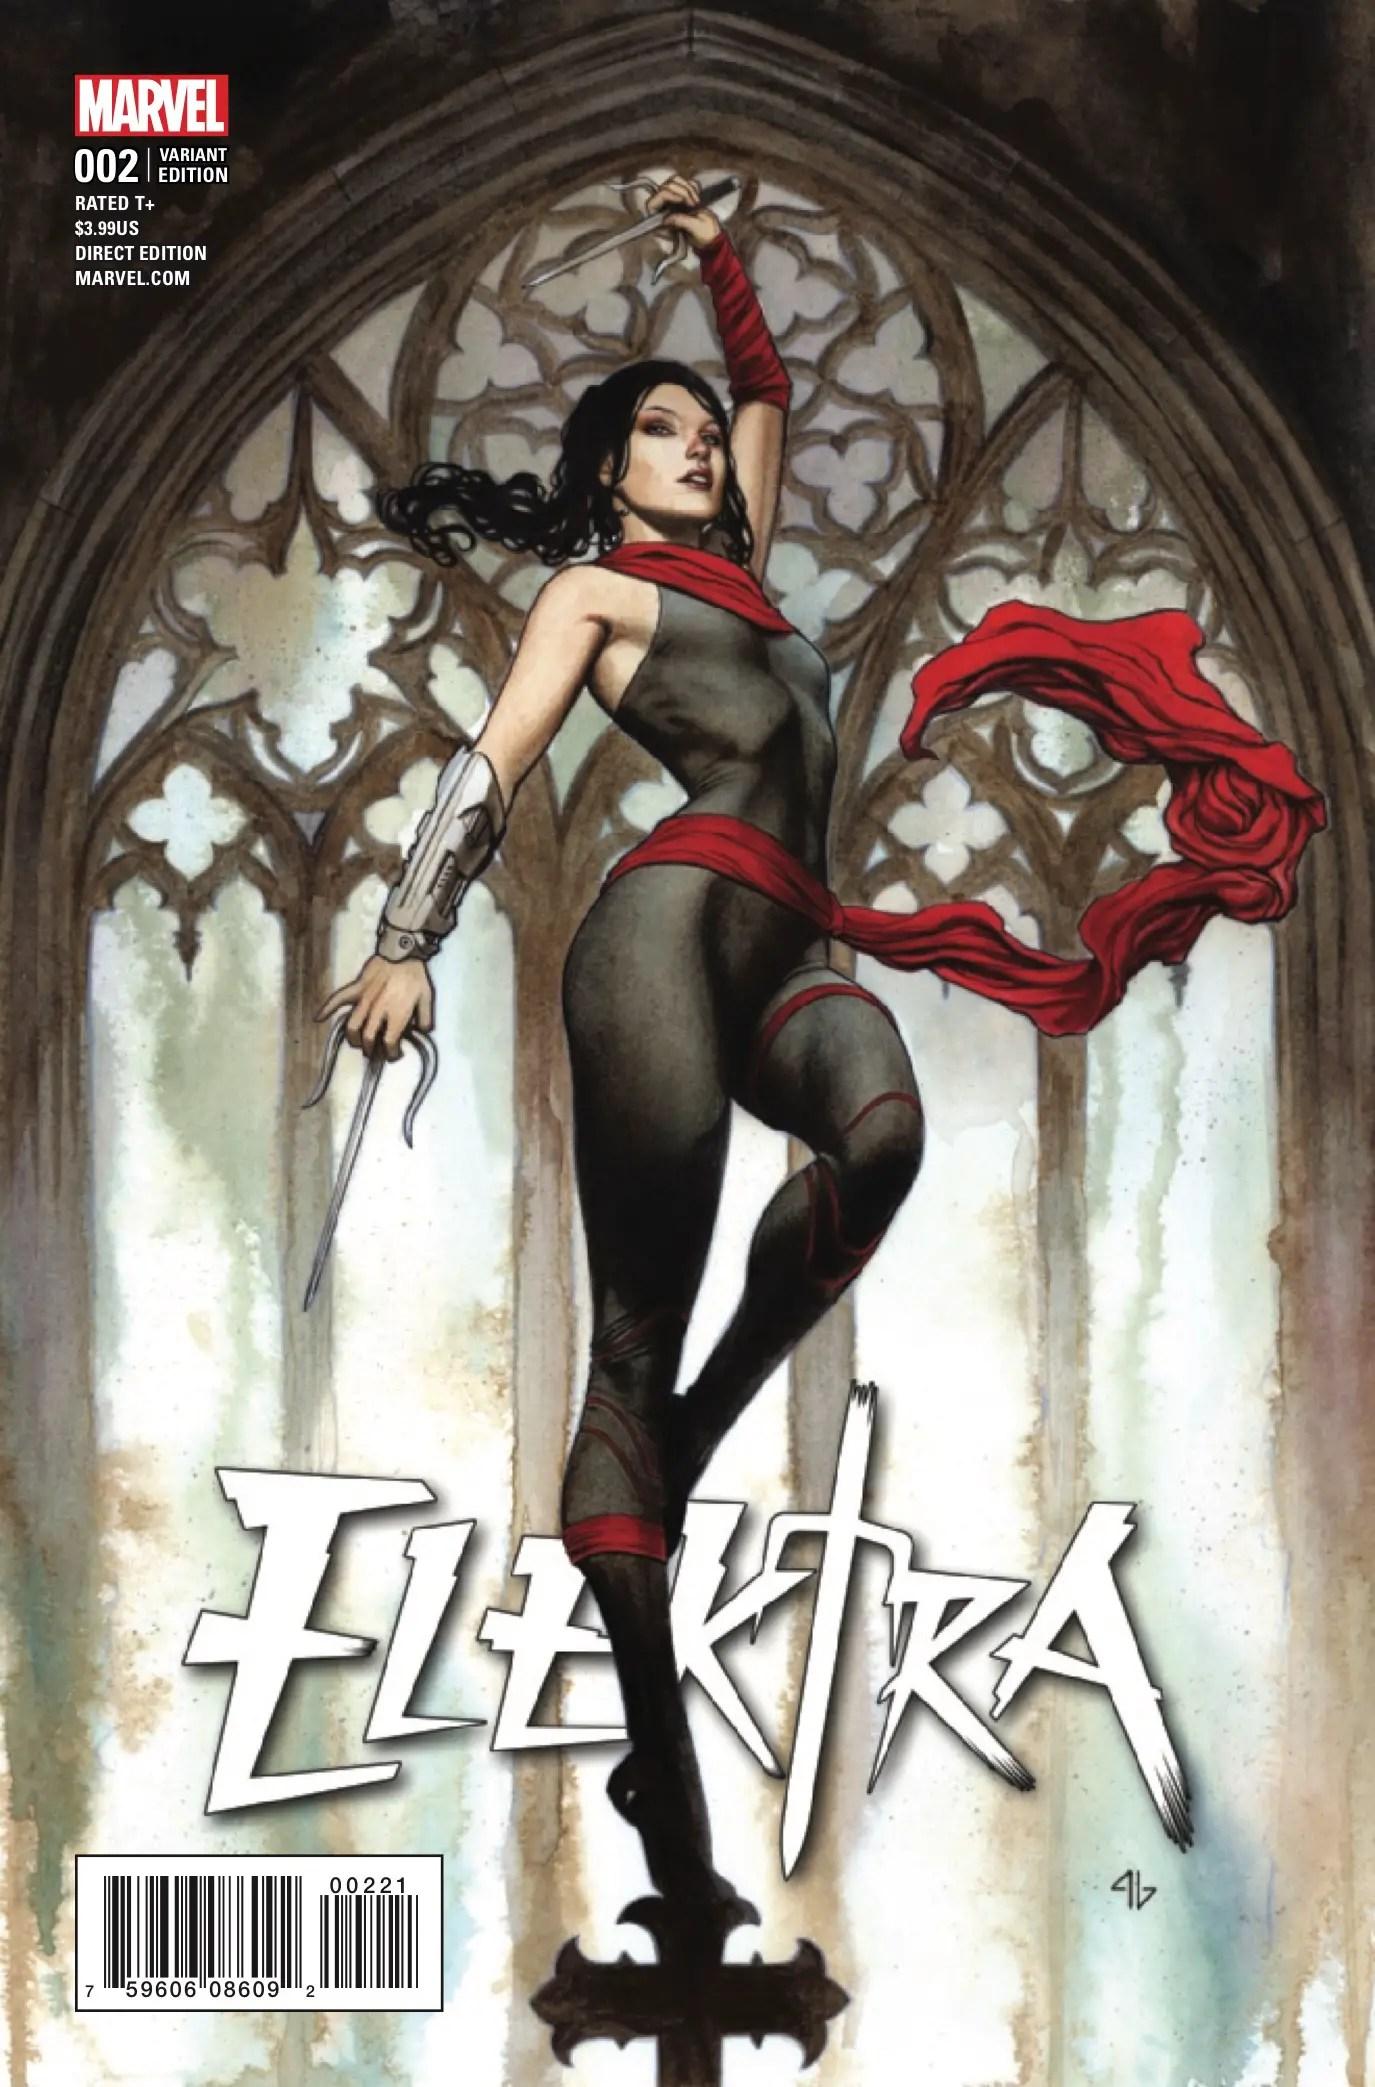 Elektra #2 Review